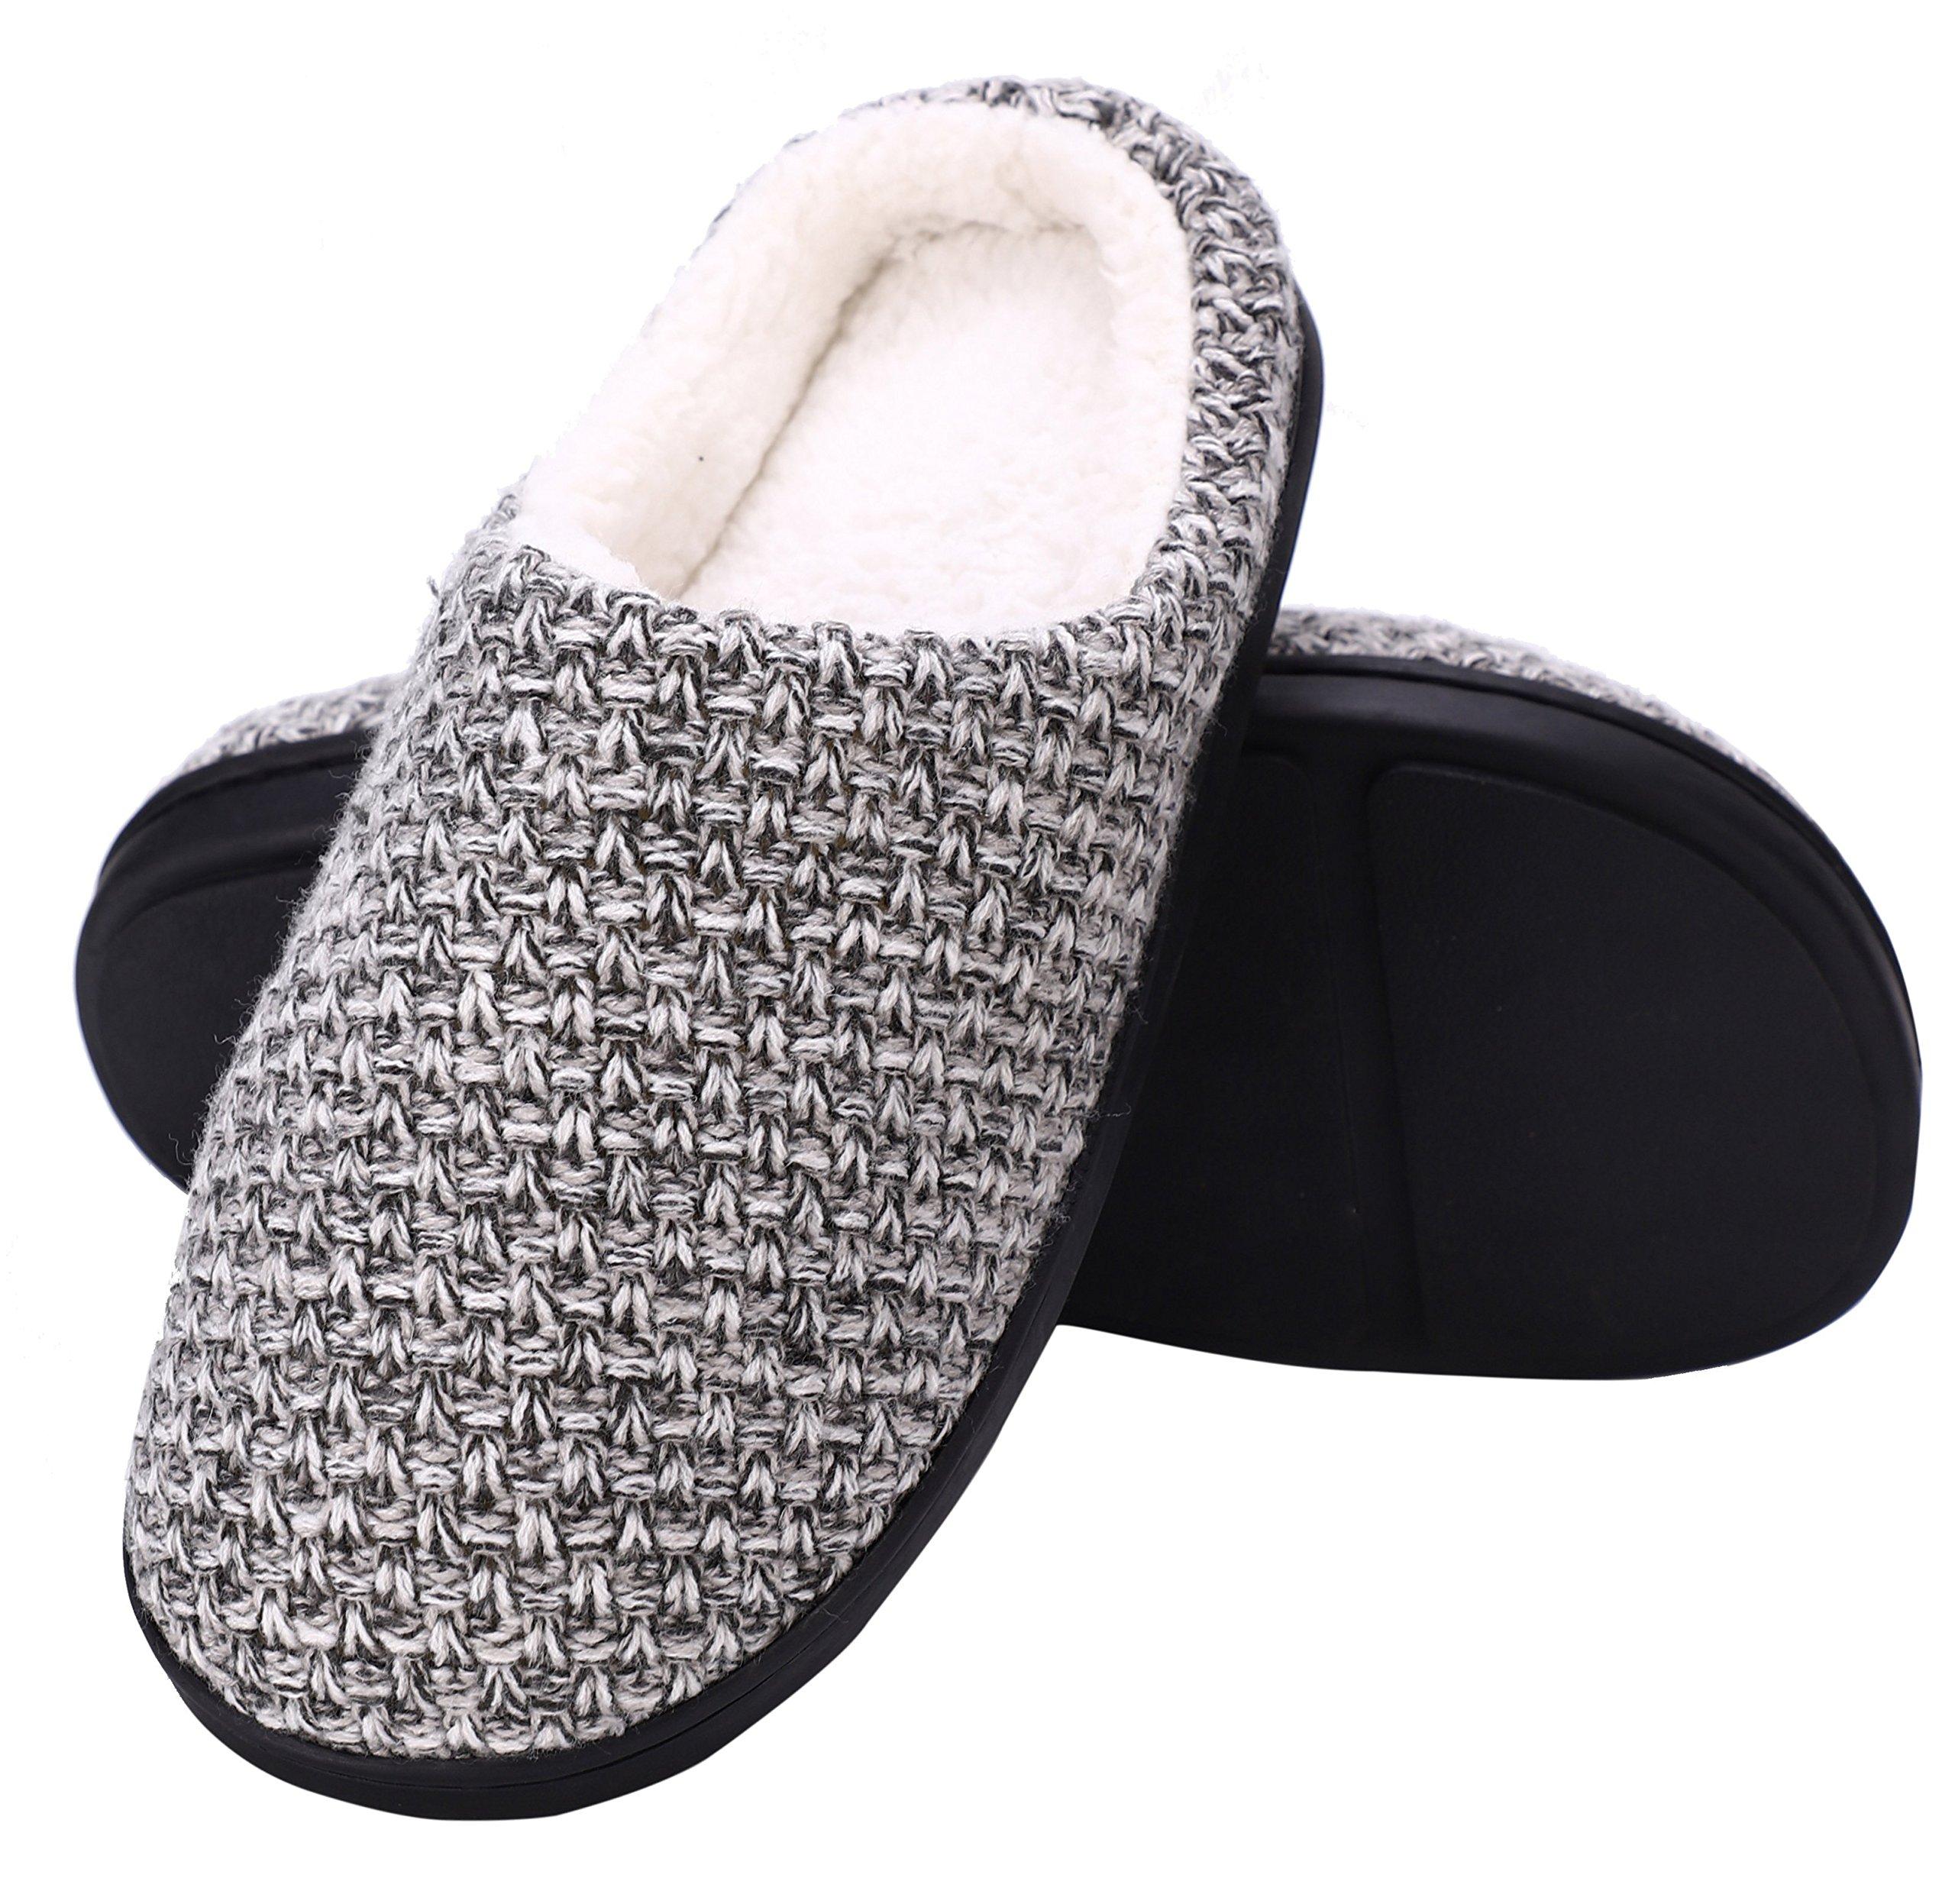 DRSLPAR House Memory Foam Slippers Comfort Plush Lining Slip-on Knit Indoor Outdoor Shoes for Men Women(Grey-Beige X-Large)